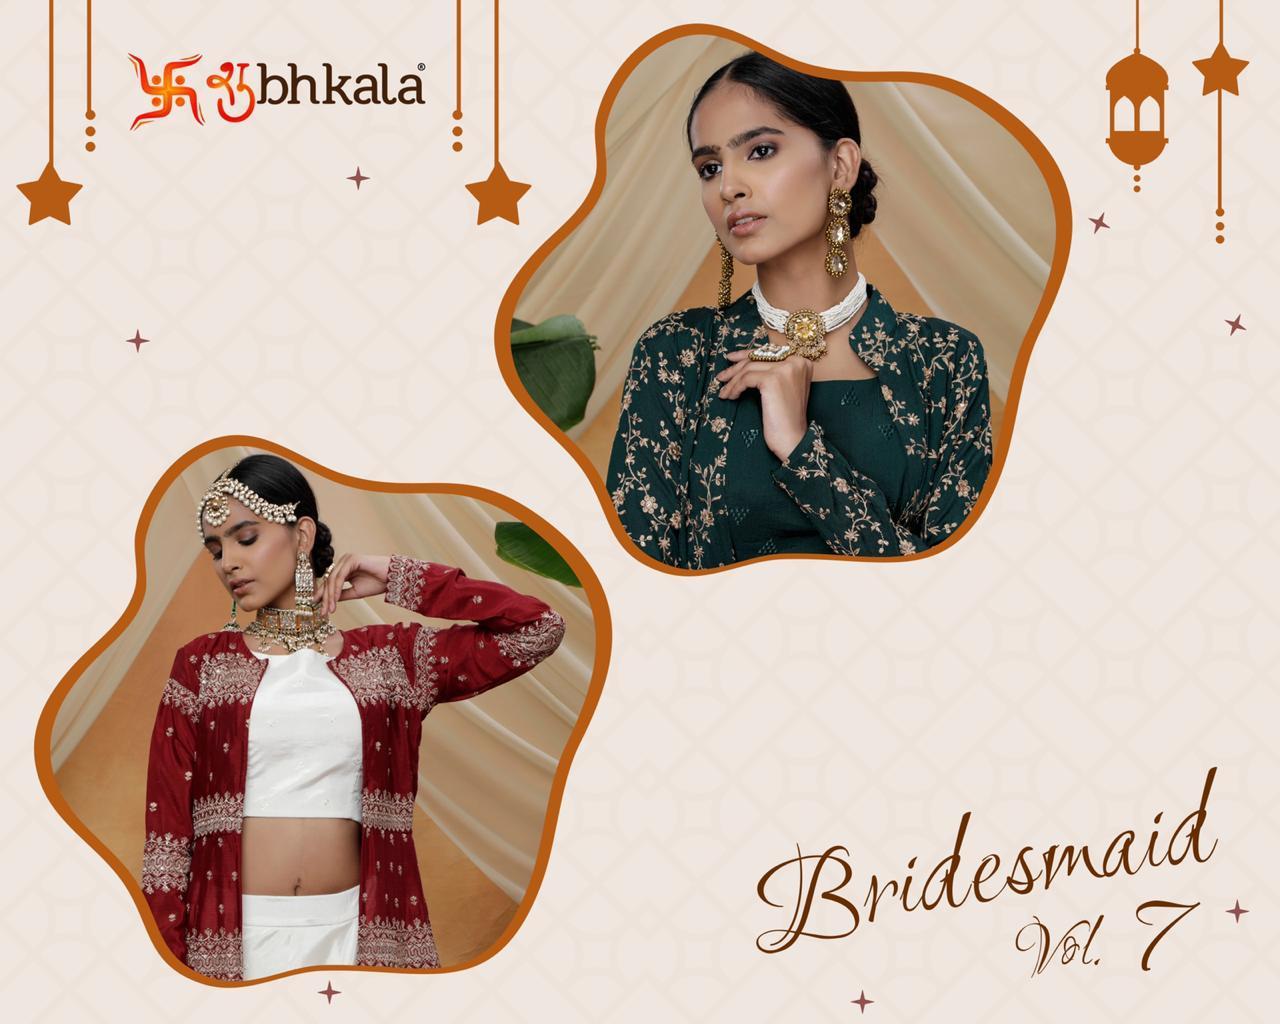 Bridesmaid Vol 7 koti style lehenga choli design best rates